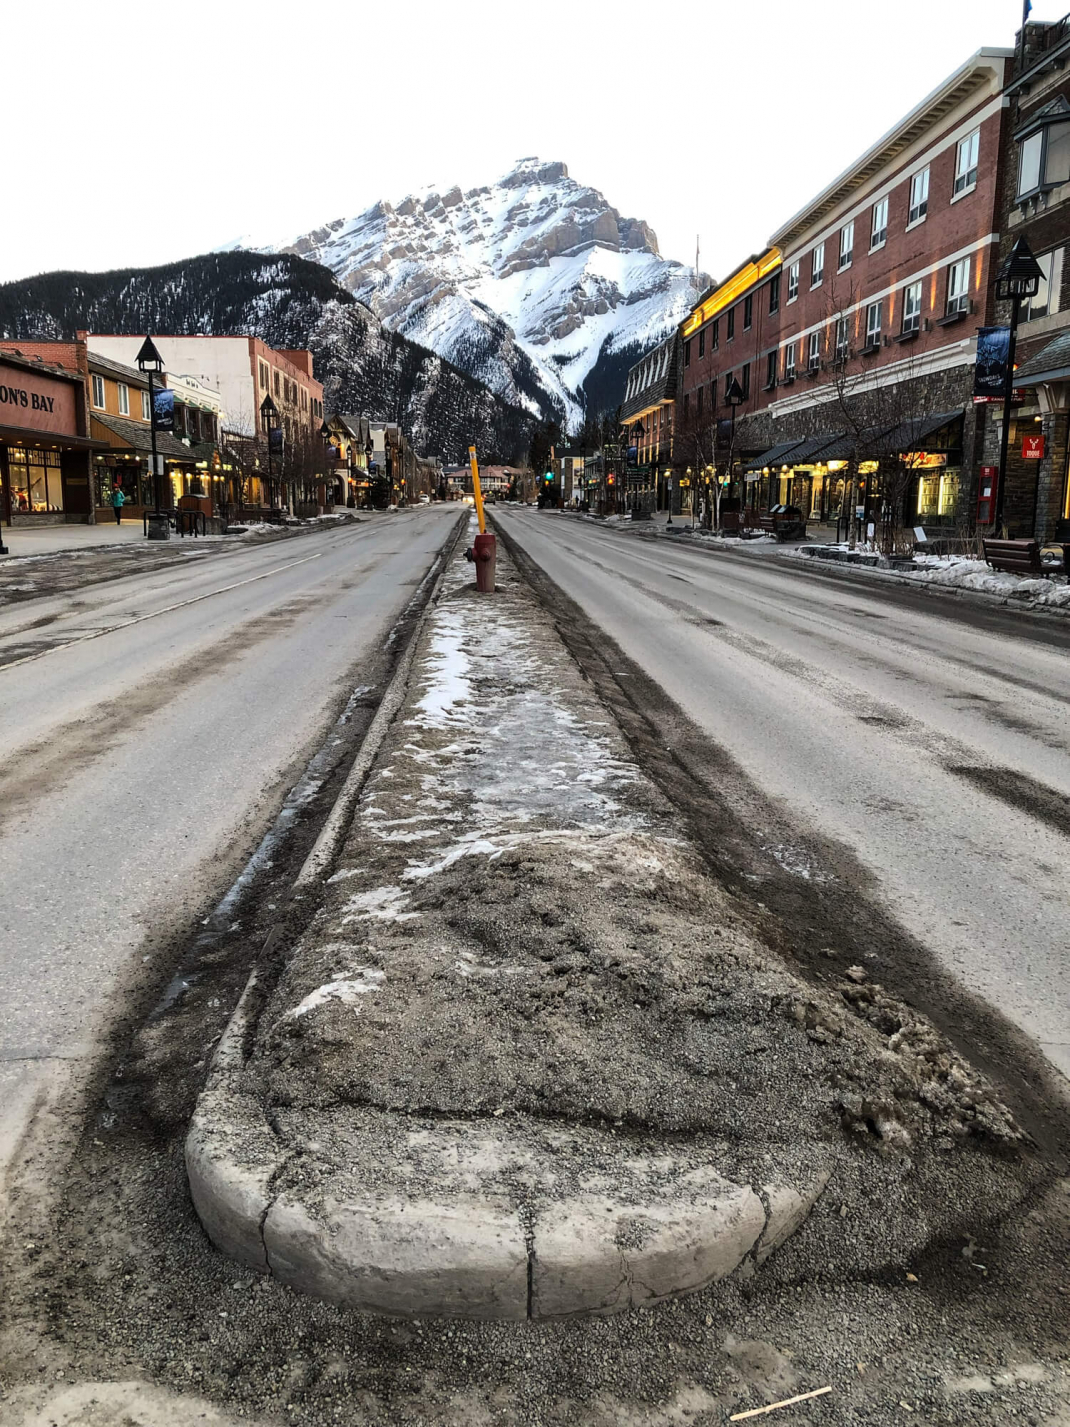 Winterurlaub in Kanada Banff Town